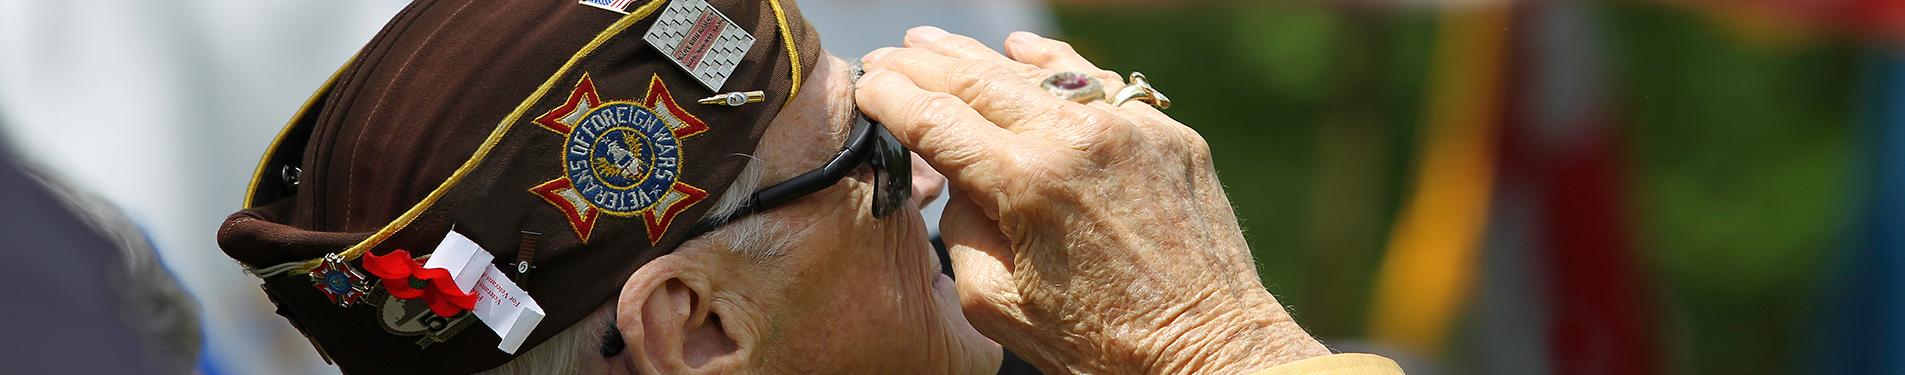 A senior veteran salutes